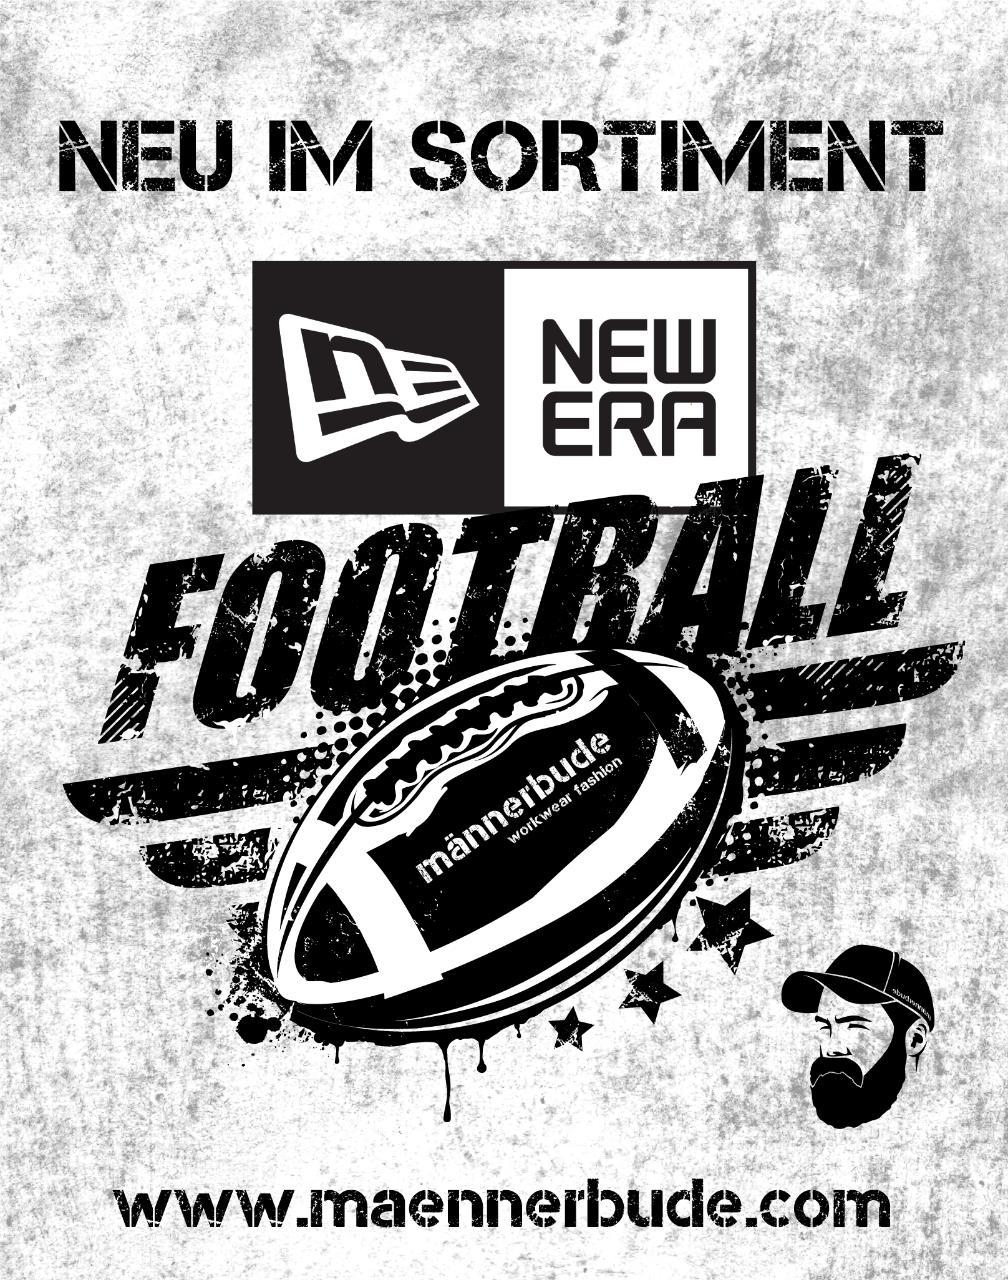 Großhandel bis zu 80% sparen großer Verkauf JETZT NEU in der männerbude: New Era NFL Klamotten | männerbude